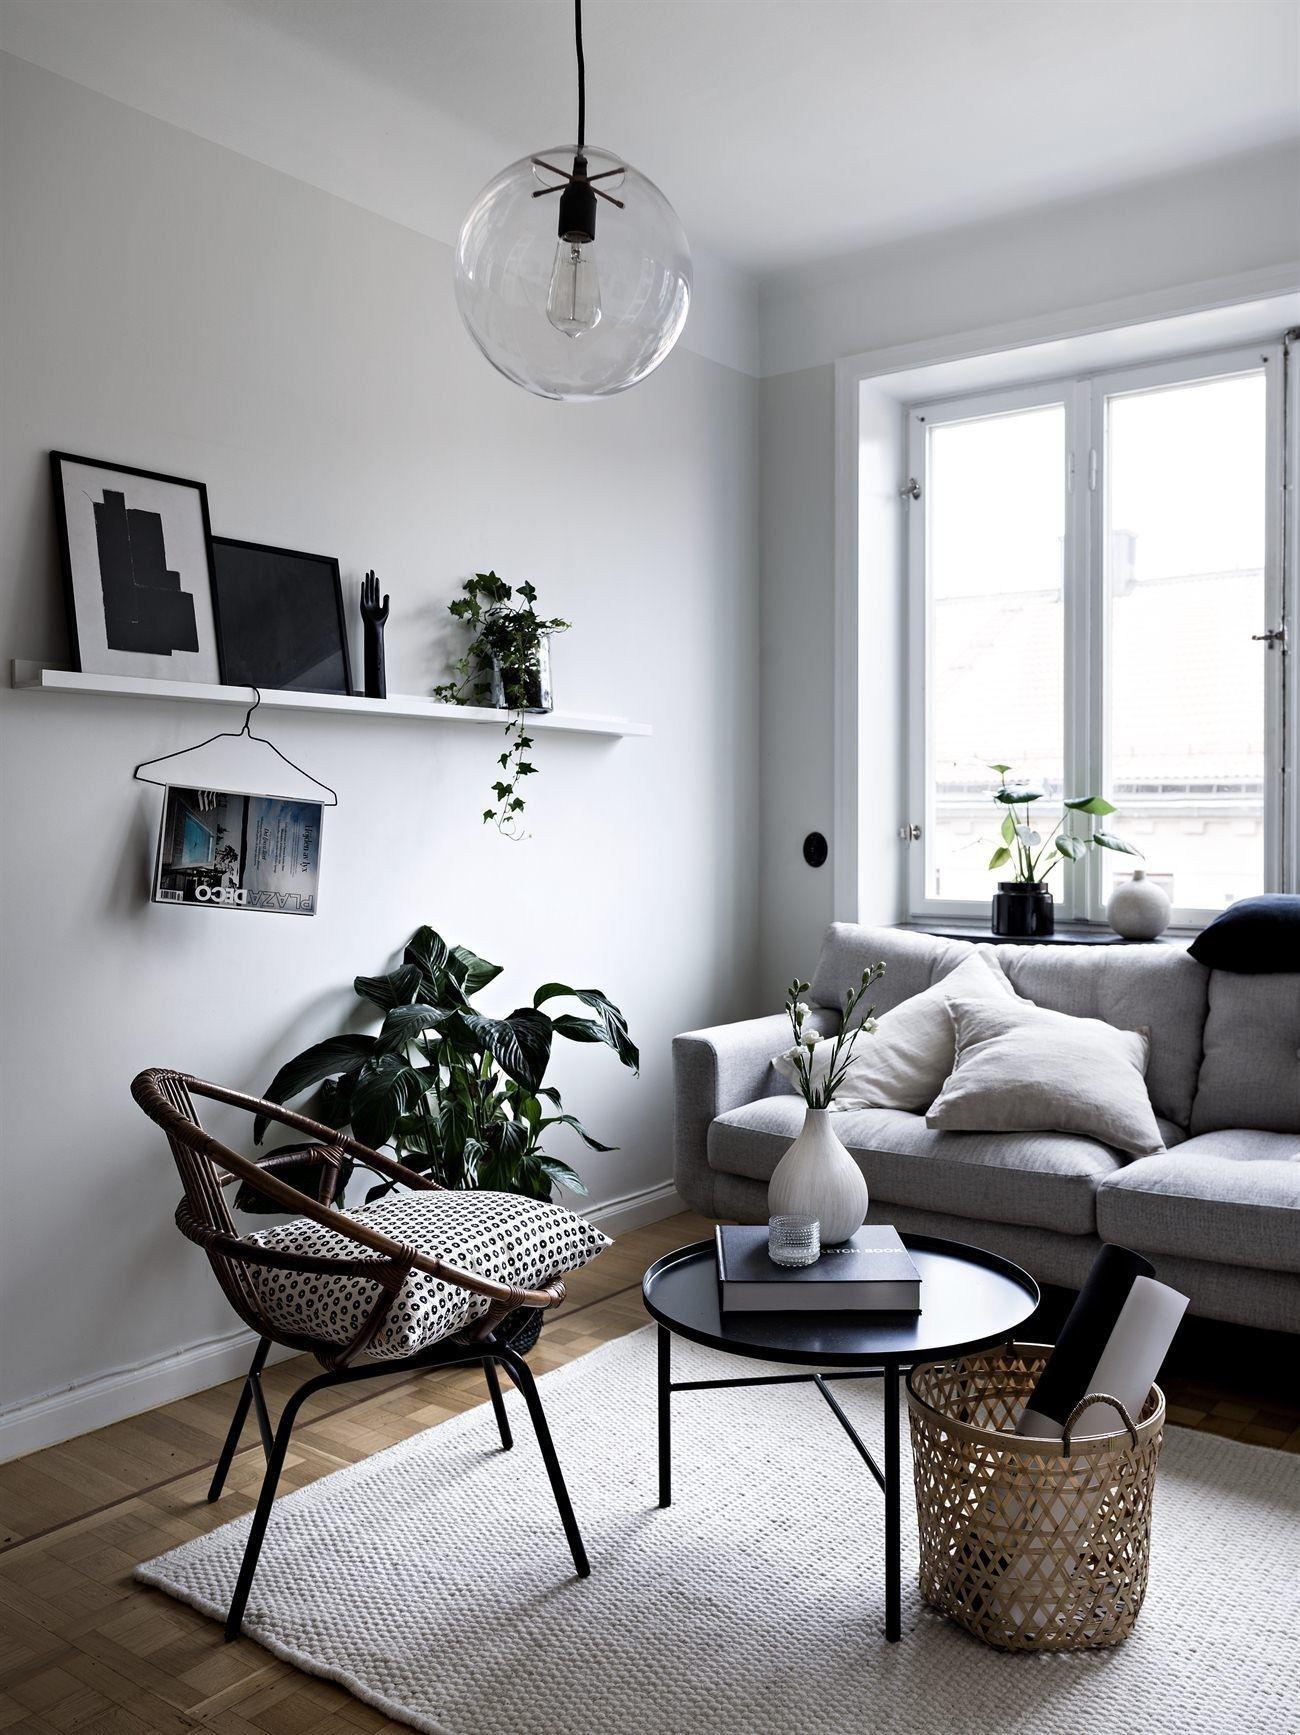 36 Minimalist Living Room Design Ideas Small Living Room Design